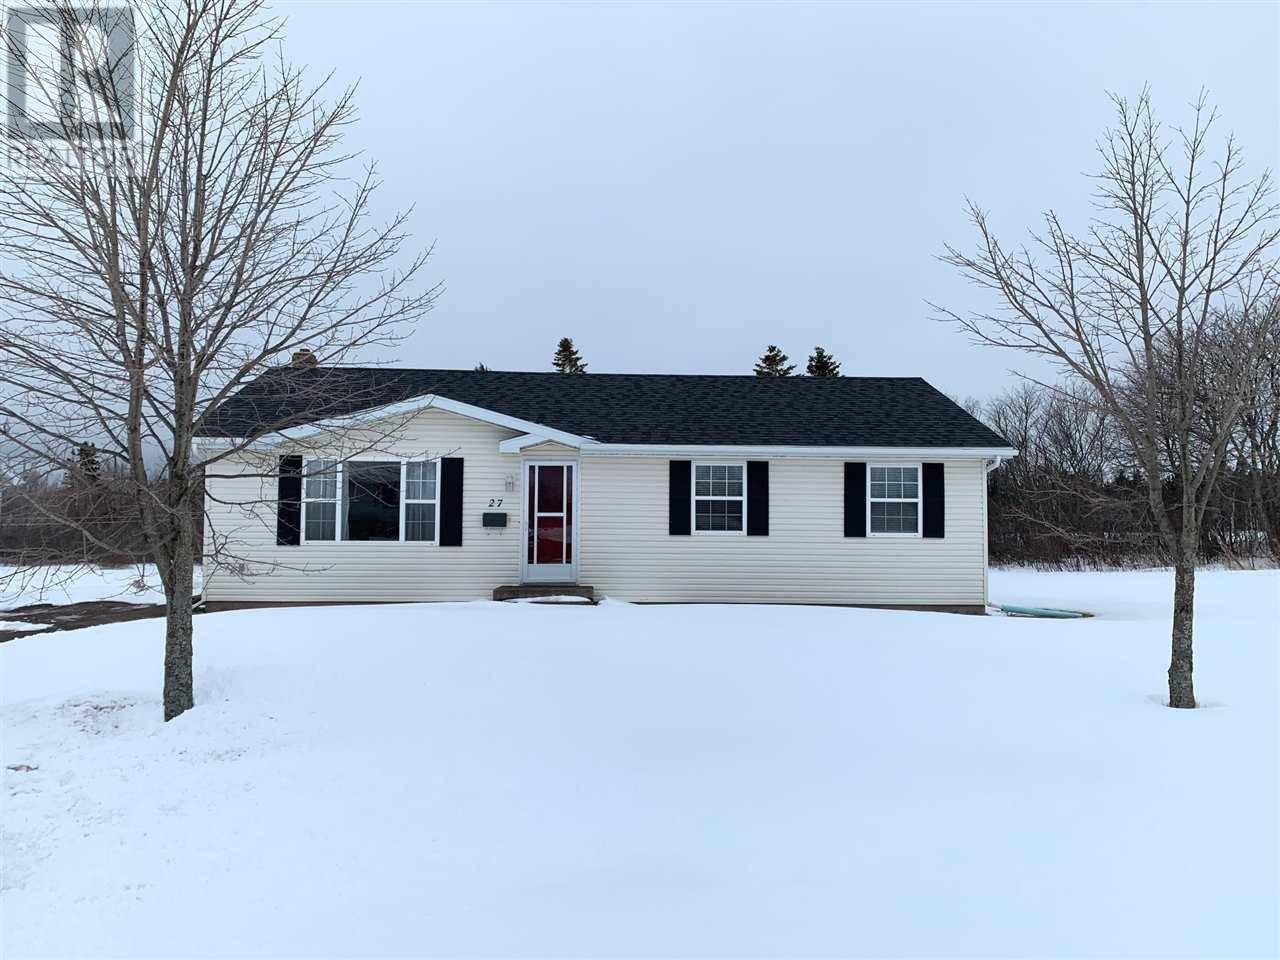 House for sale at 27 Friar Dr Sherwood Prince Edward Island - MLS: 202005499